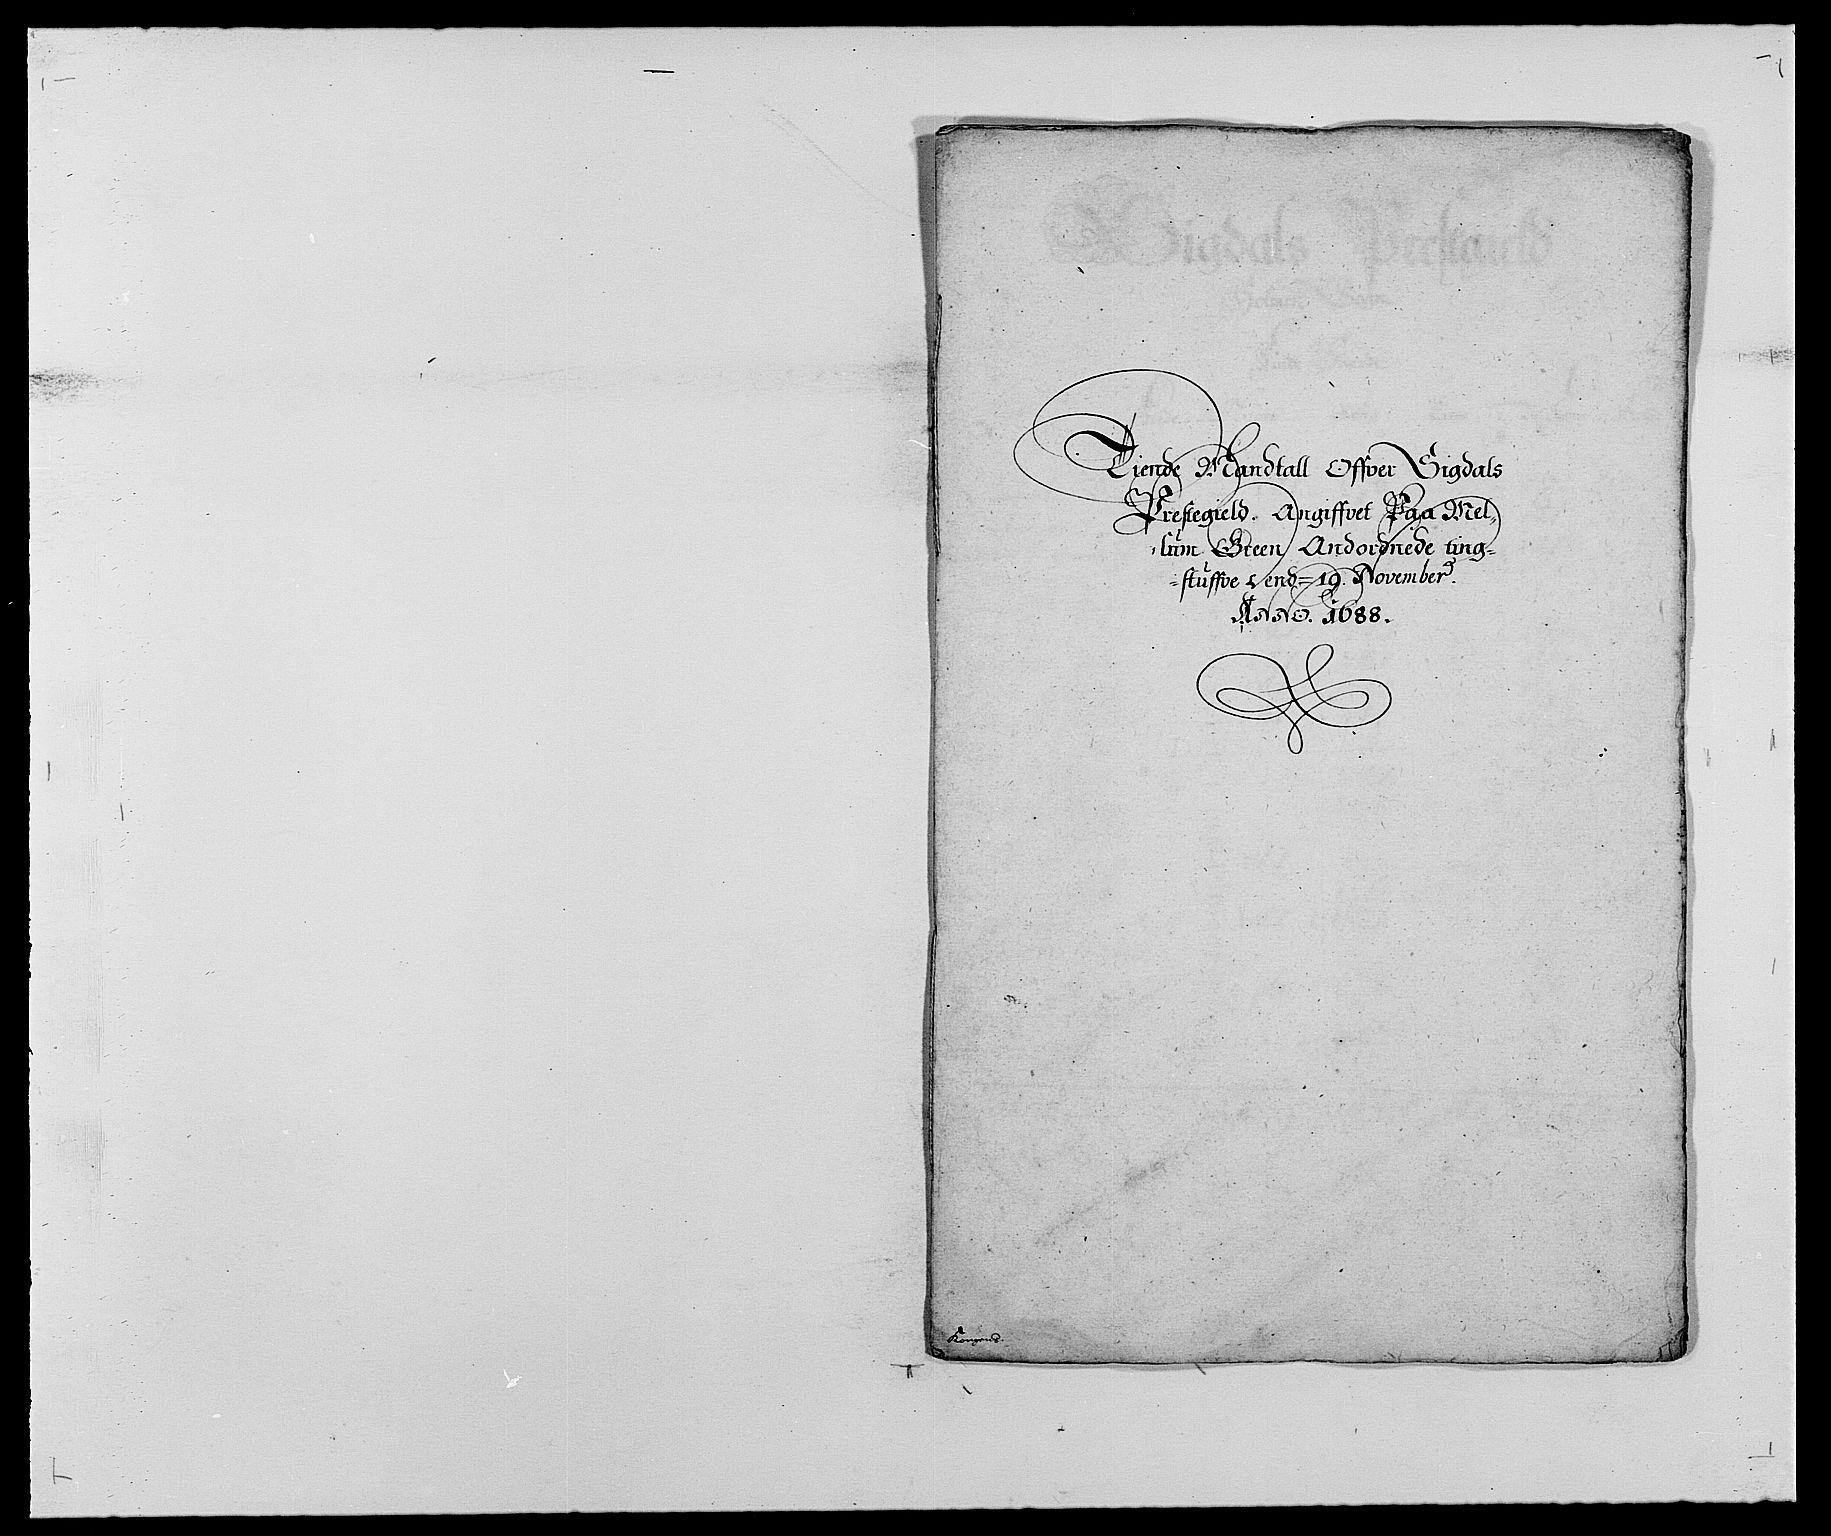 RA, Rentekammeret inntil 1814, Reviderte regnskaper, Fogderegnskap, R25/L1679: Fogderegnskap Buskerud, 1687-1688, s. 275